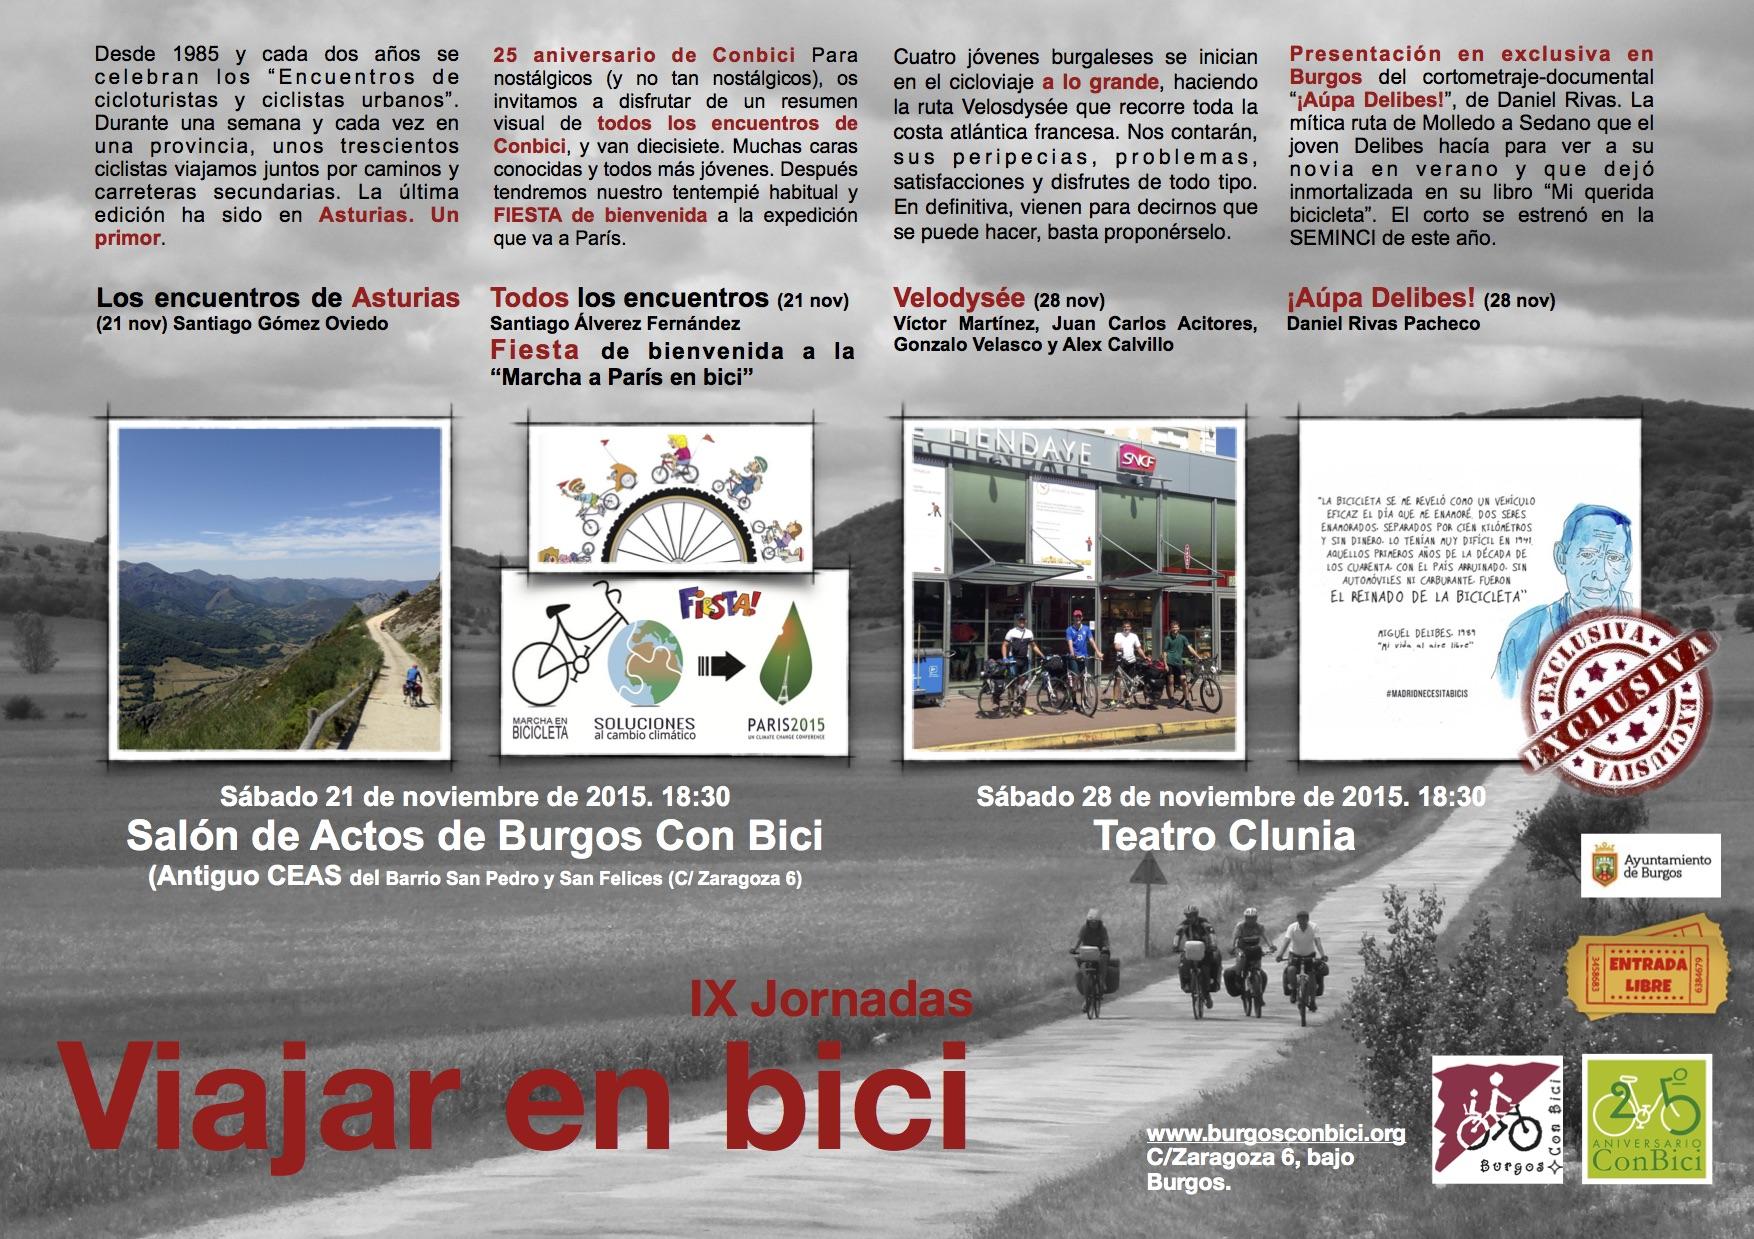 IX Jornadas Viajar en bici. Cartel... 2015